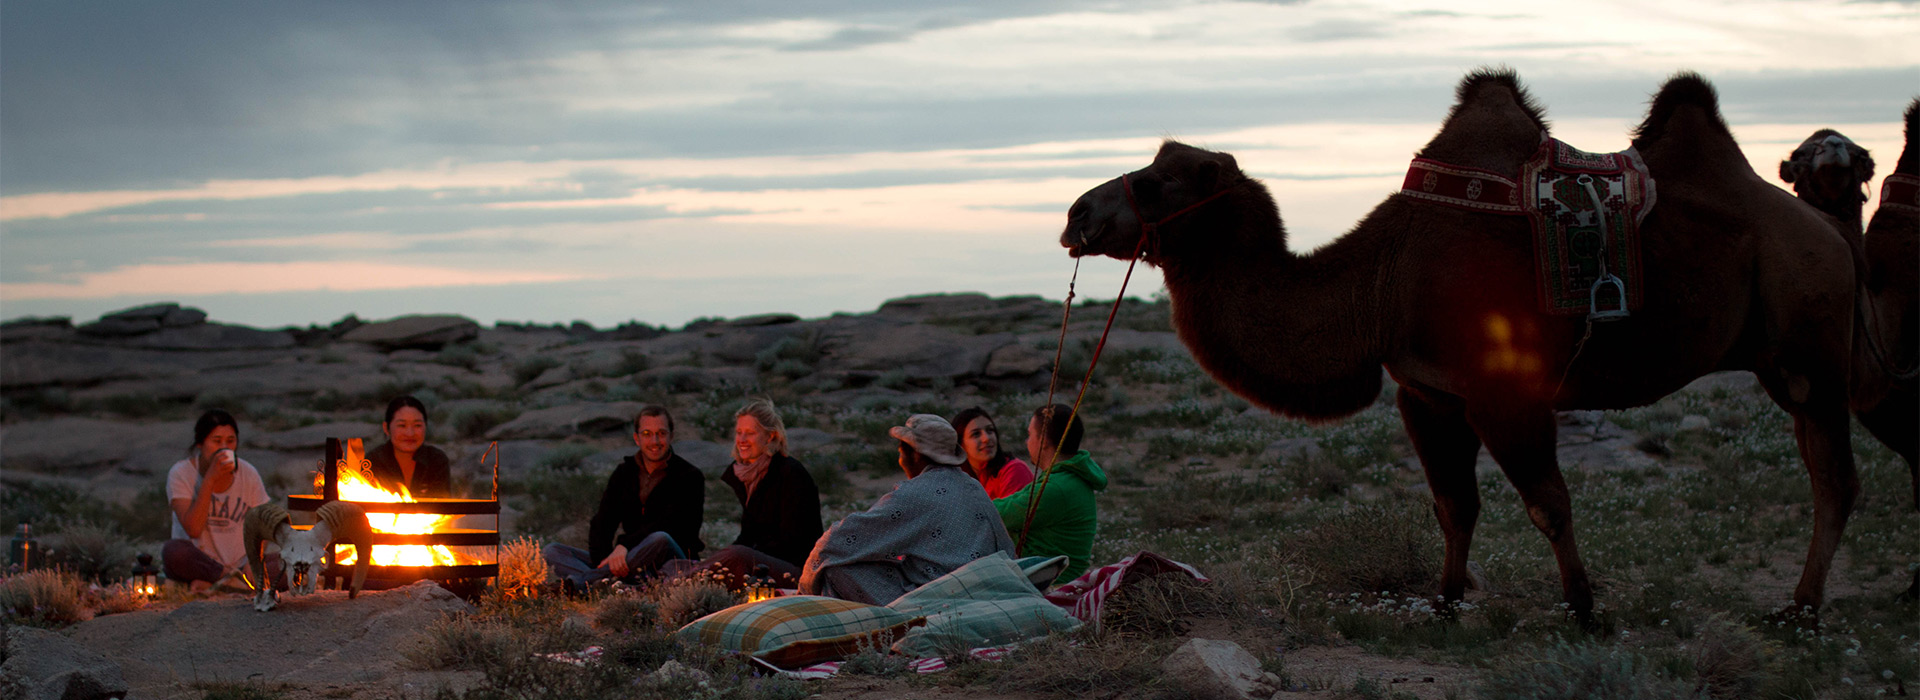 relax-time-in-ikhnart-rocks-wilderness-ger-camp